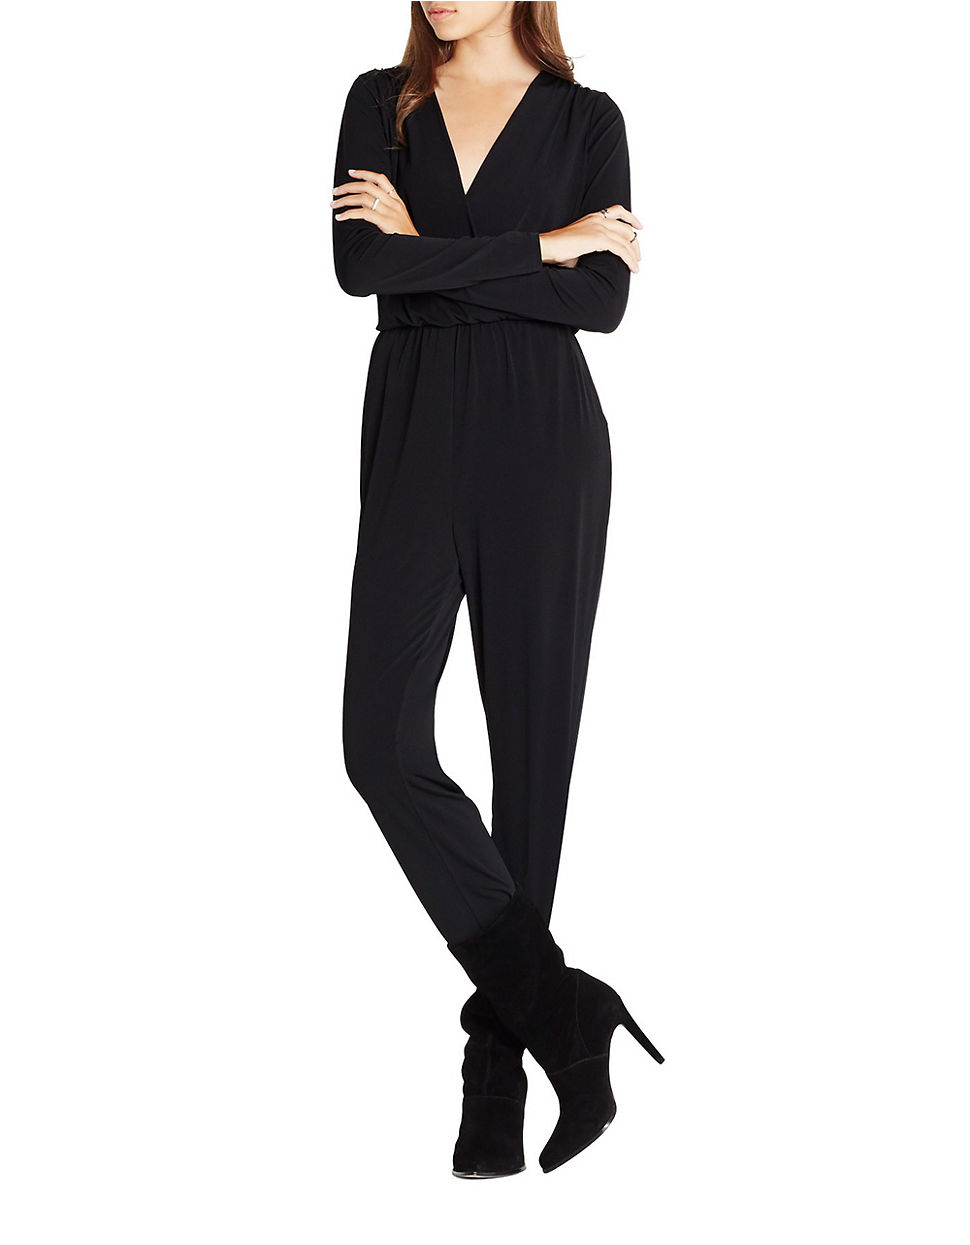 d76abf438f3f Lyst - Bcbgeneration V-neck Jumpsuit in Black